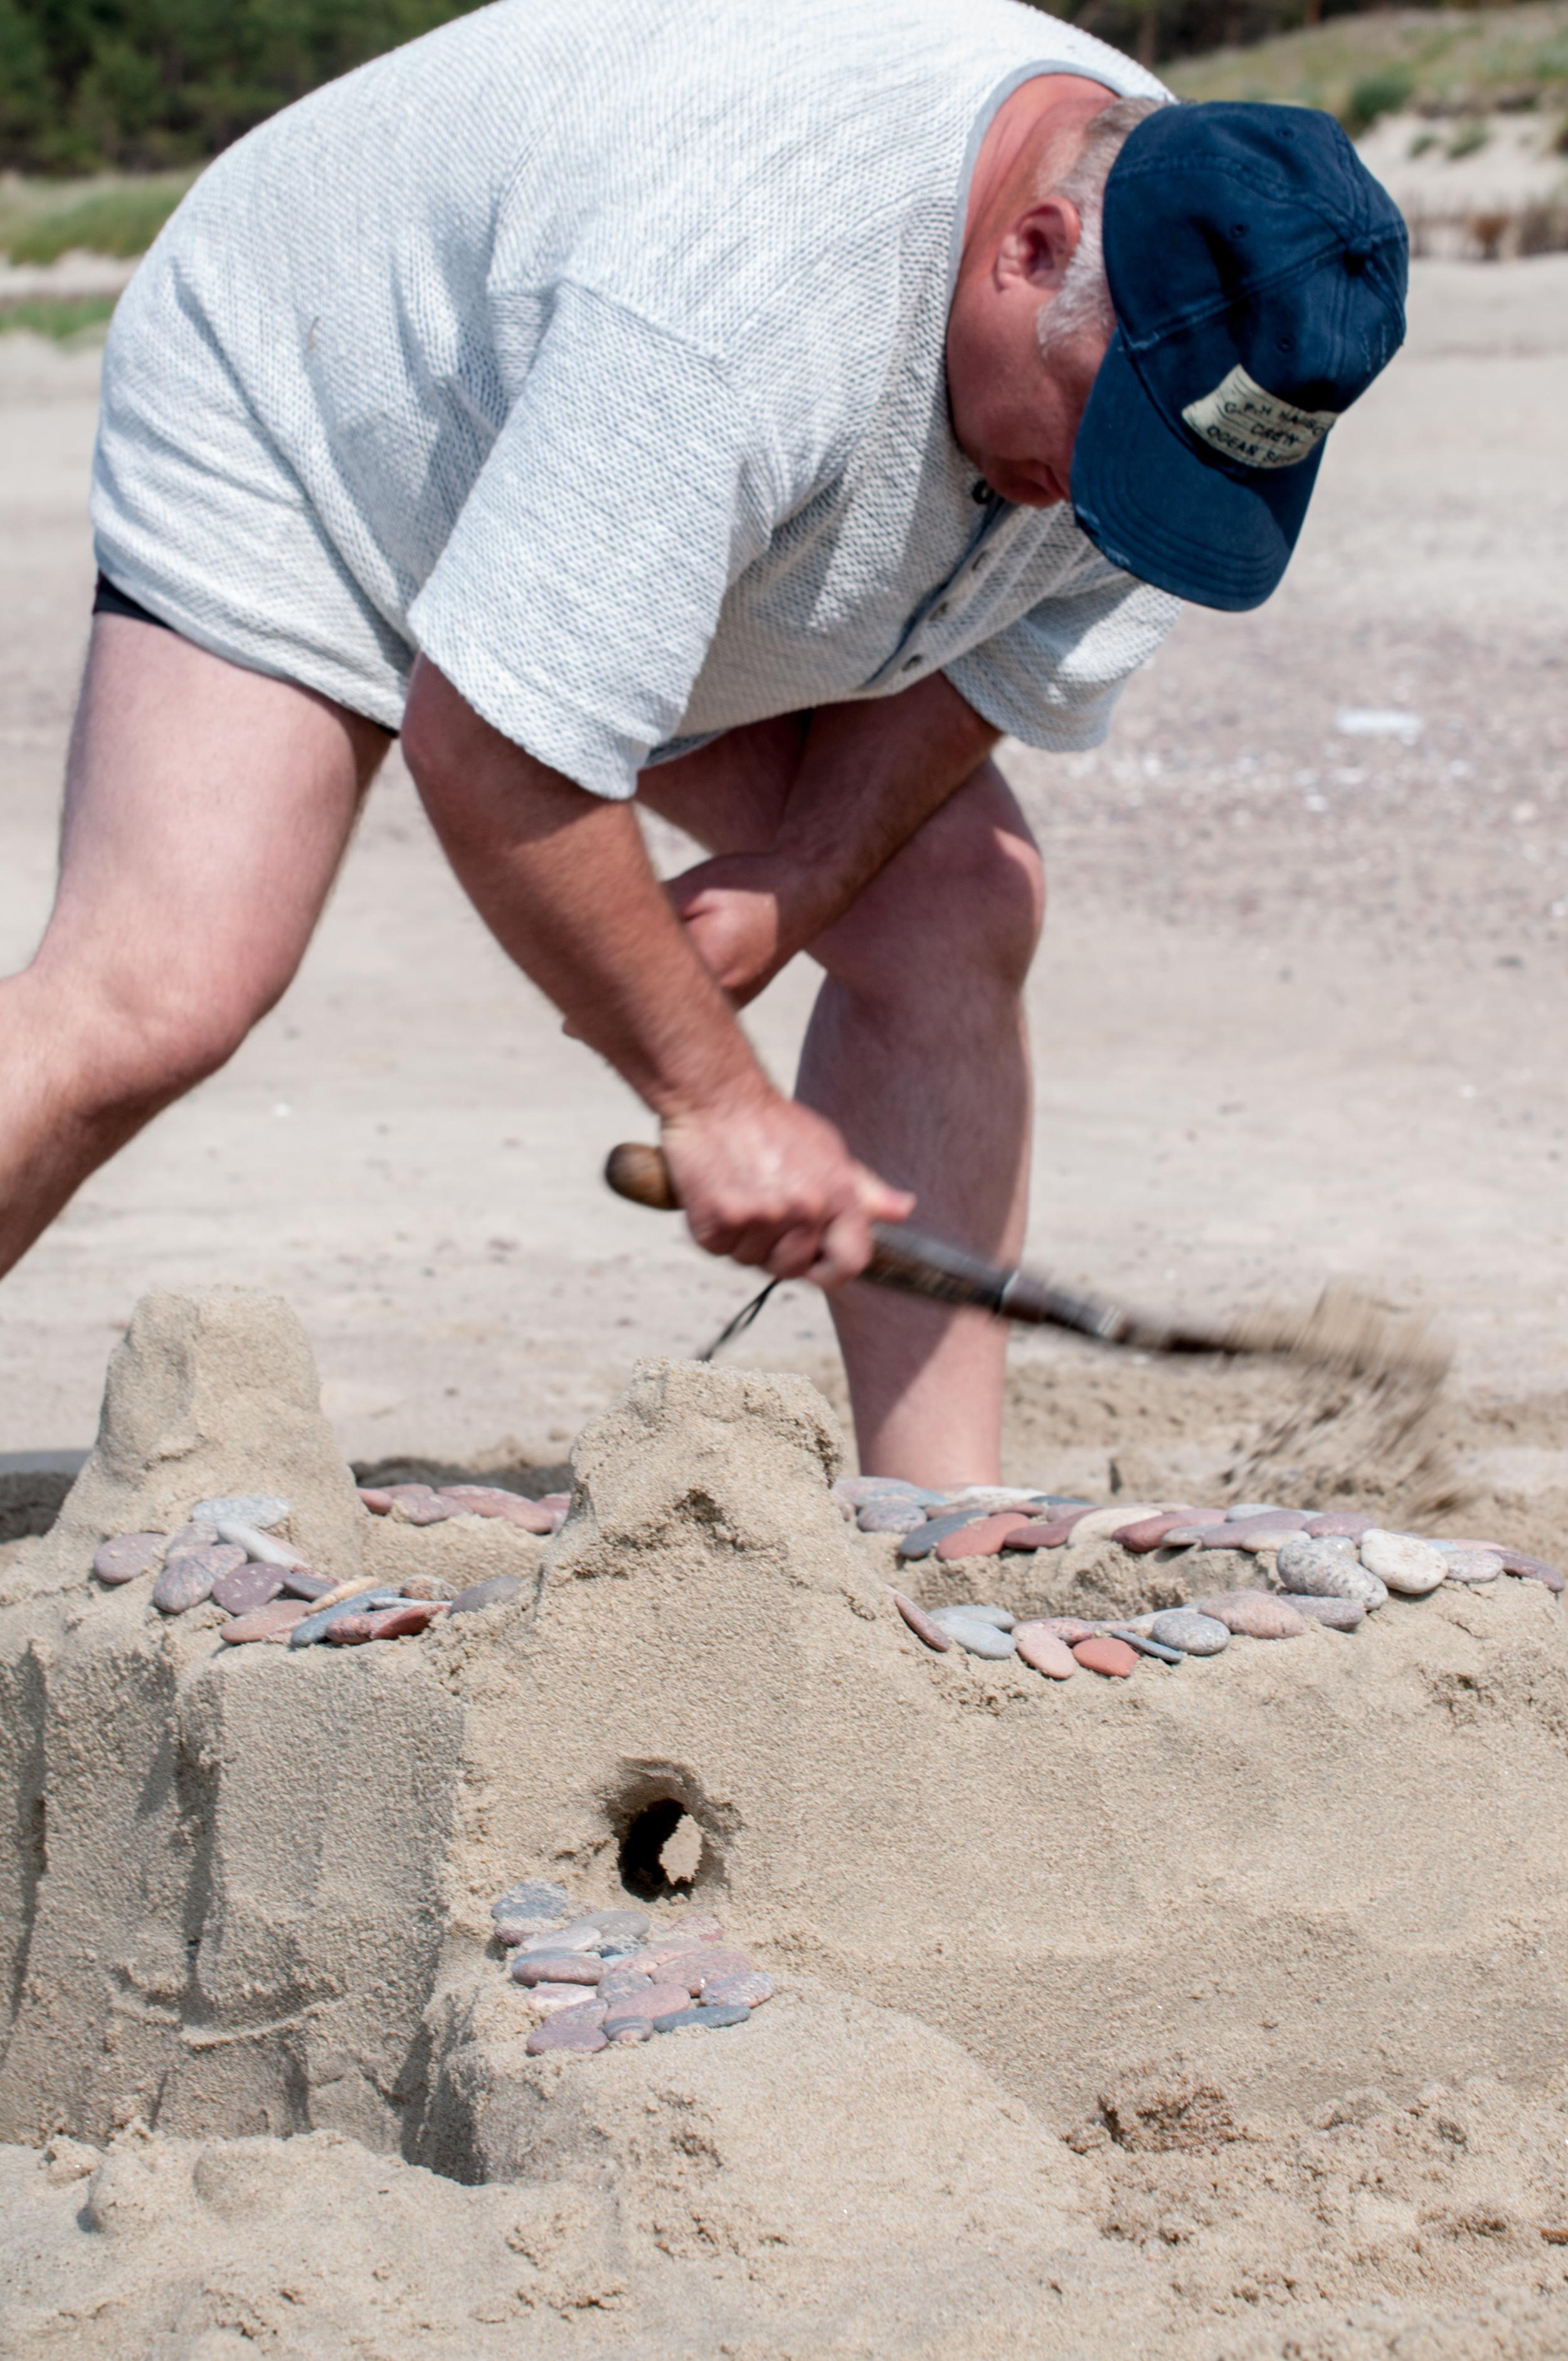 Man building a Castel - 140610 - DSC_1337-4.JPG